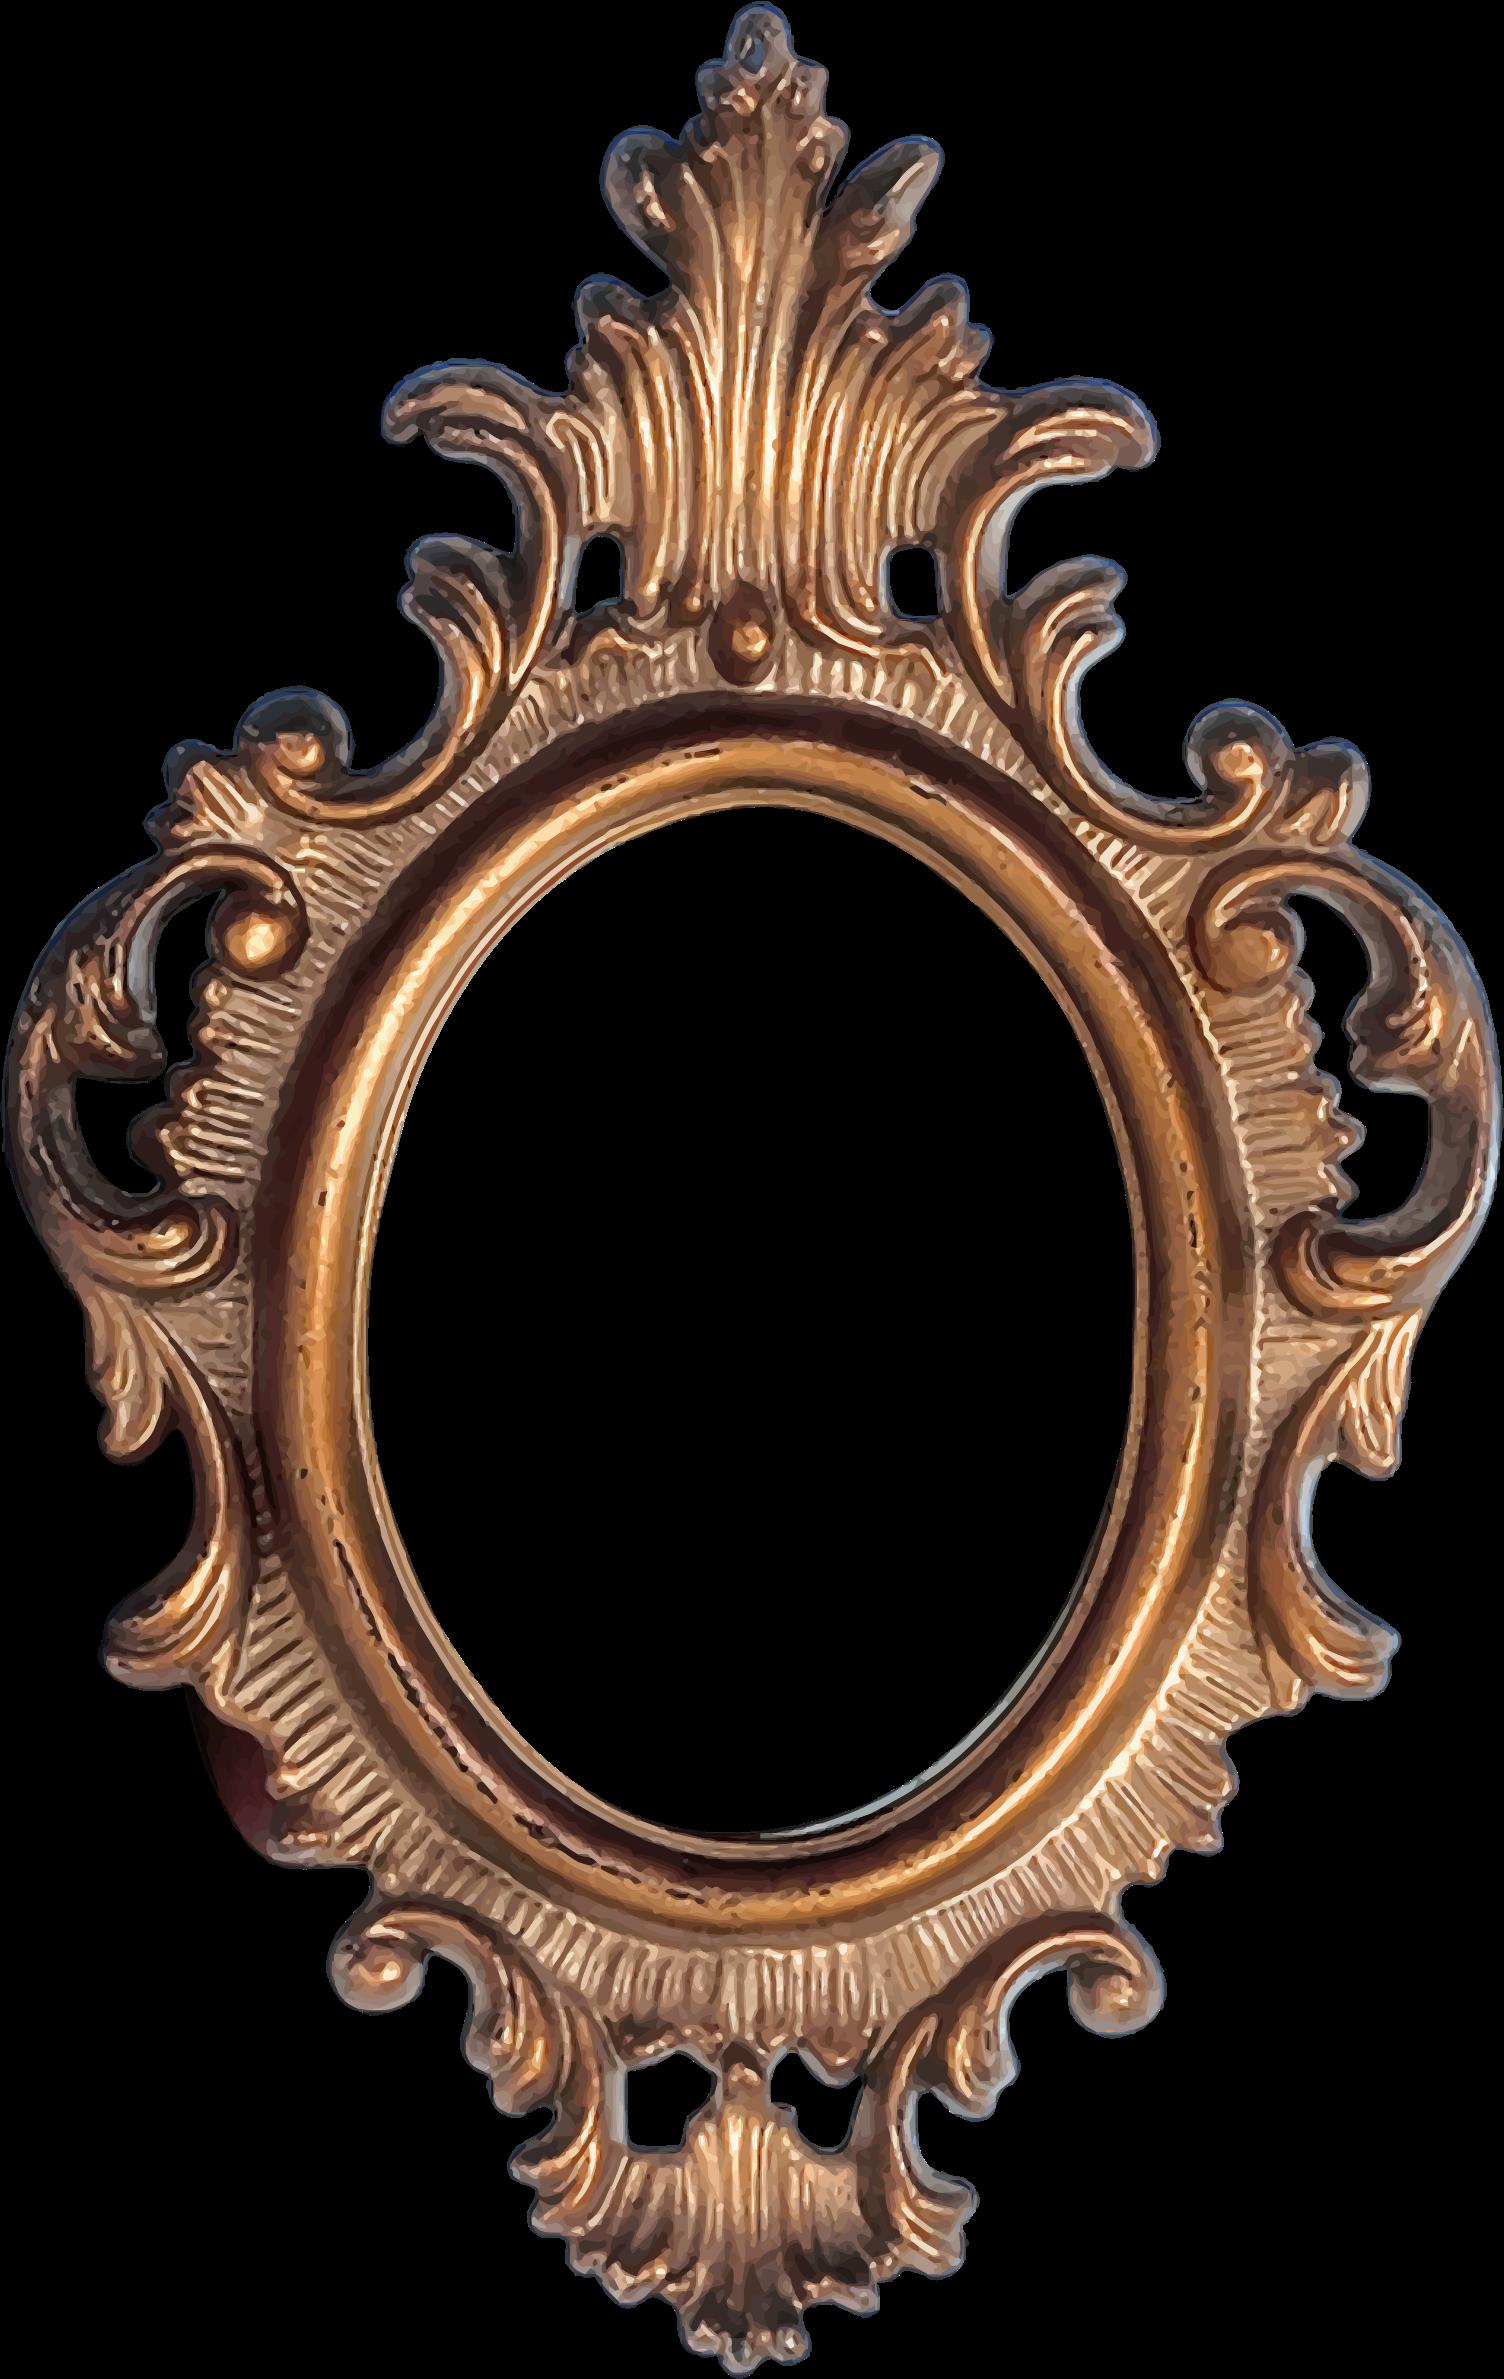 Mirror clipart ornate. Frame big image png